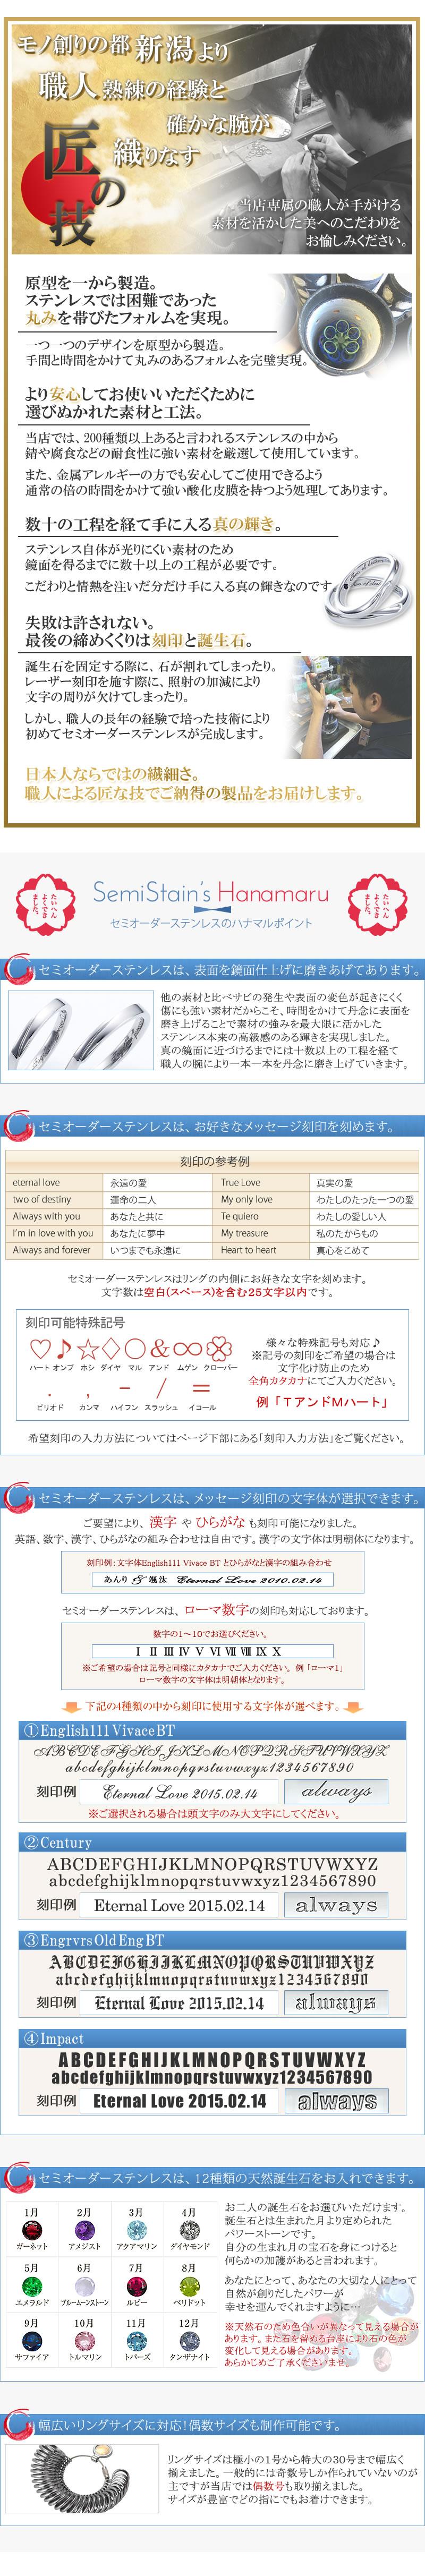 鏡面仕上げ 文字体選択 誕生石選択 1号~30号まで対応